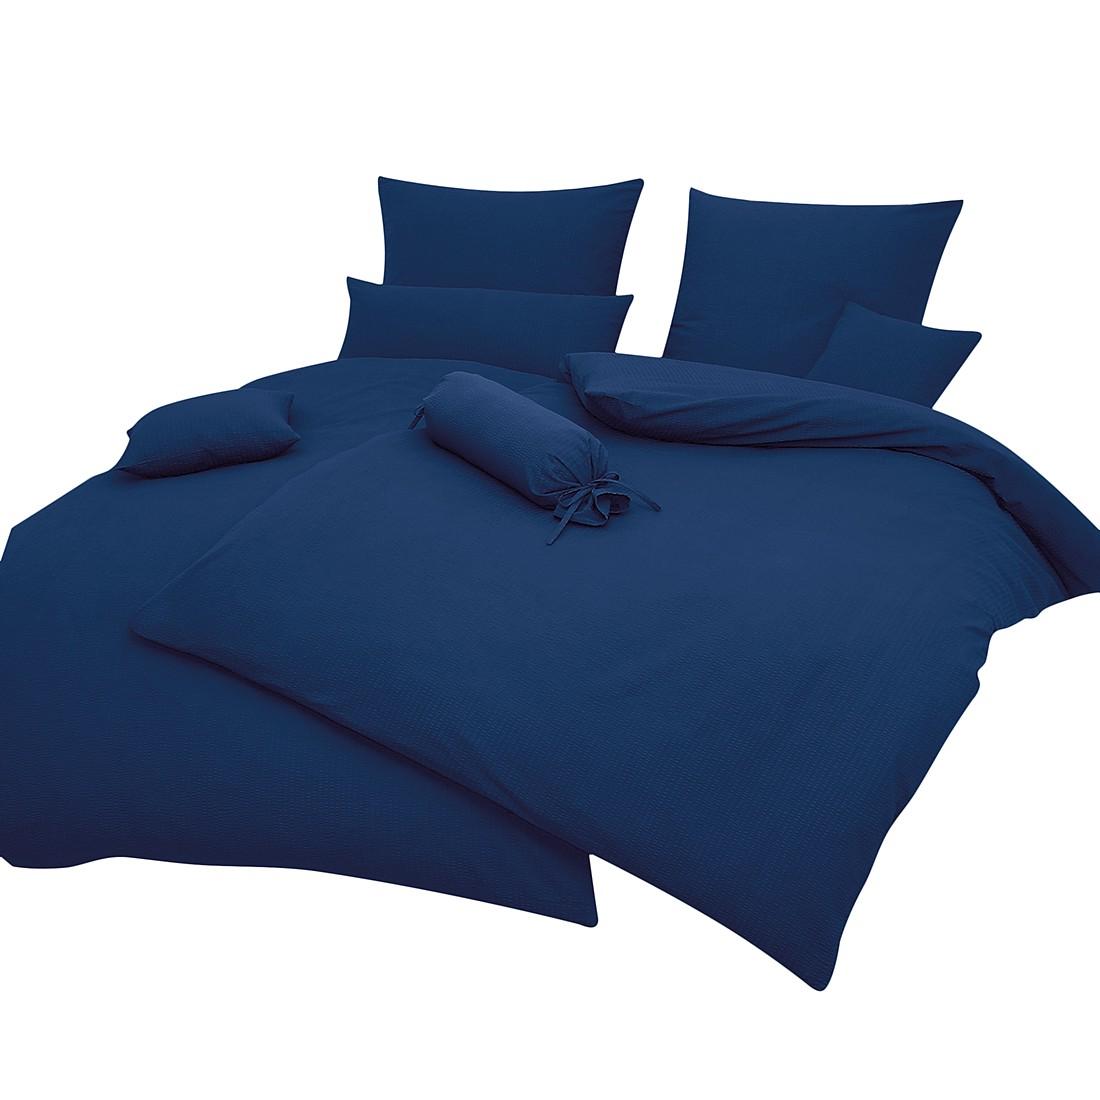 Home 24 - Taie d oreiller piano uni - bleu marine - 40 x 80 cm, janine